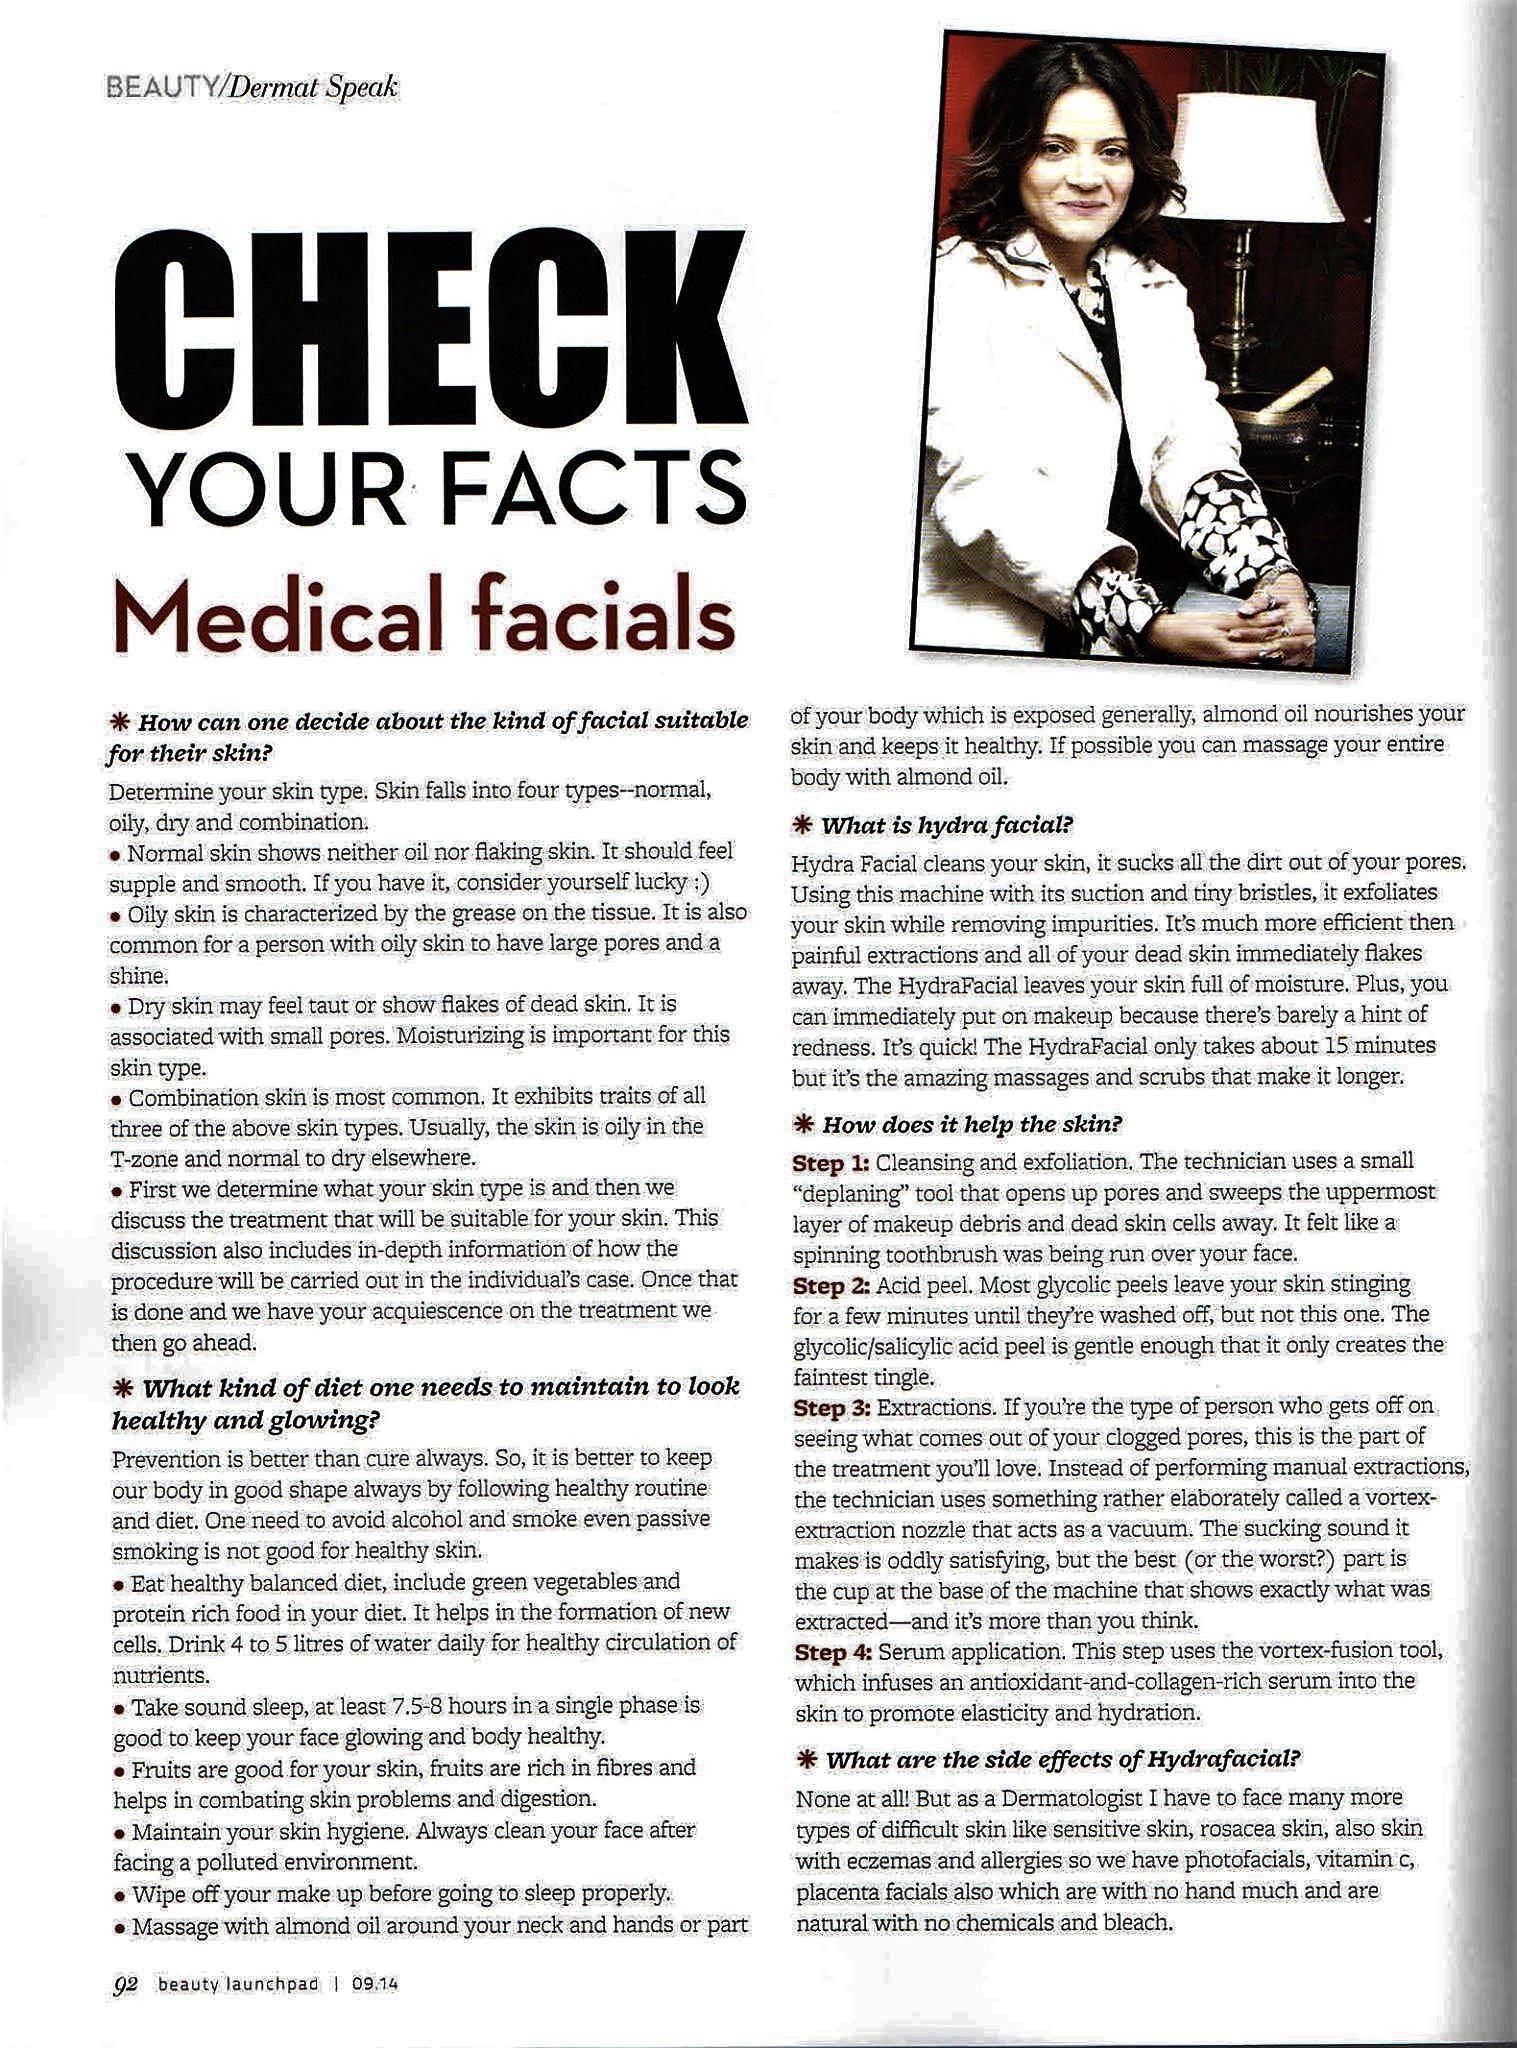 Medical Facials Facts Dermatologist Drdeepalibhardwaj Skincare